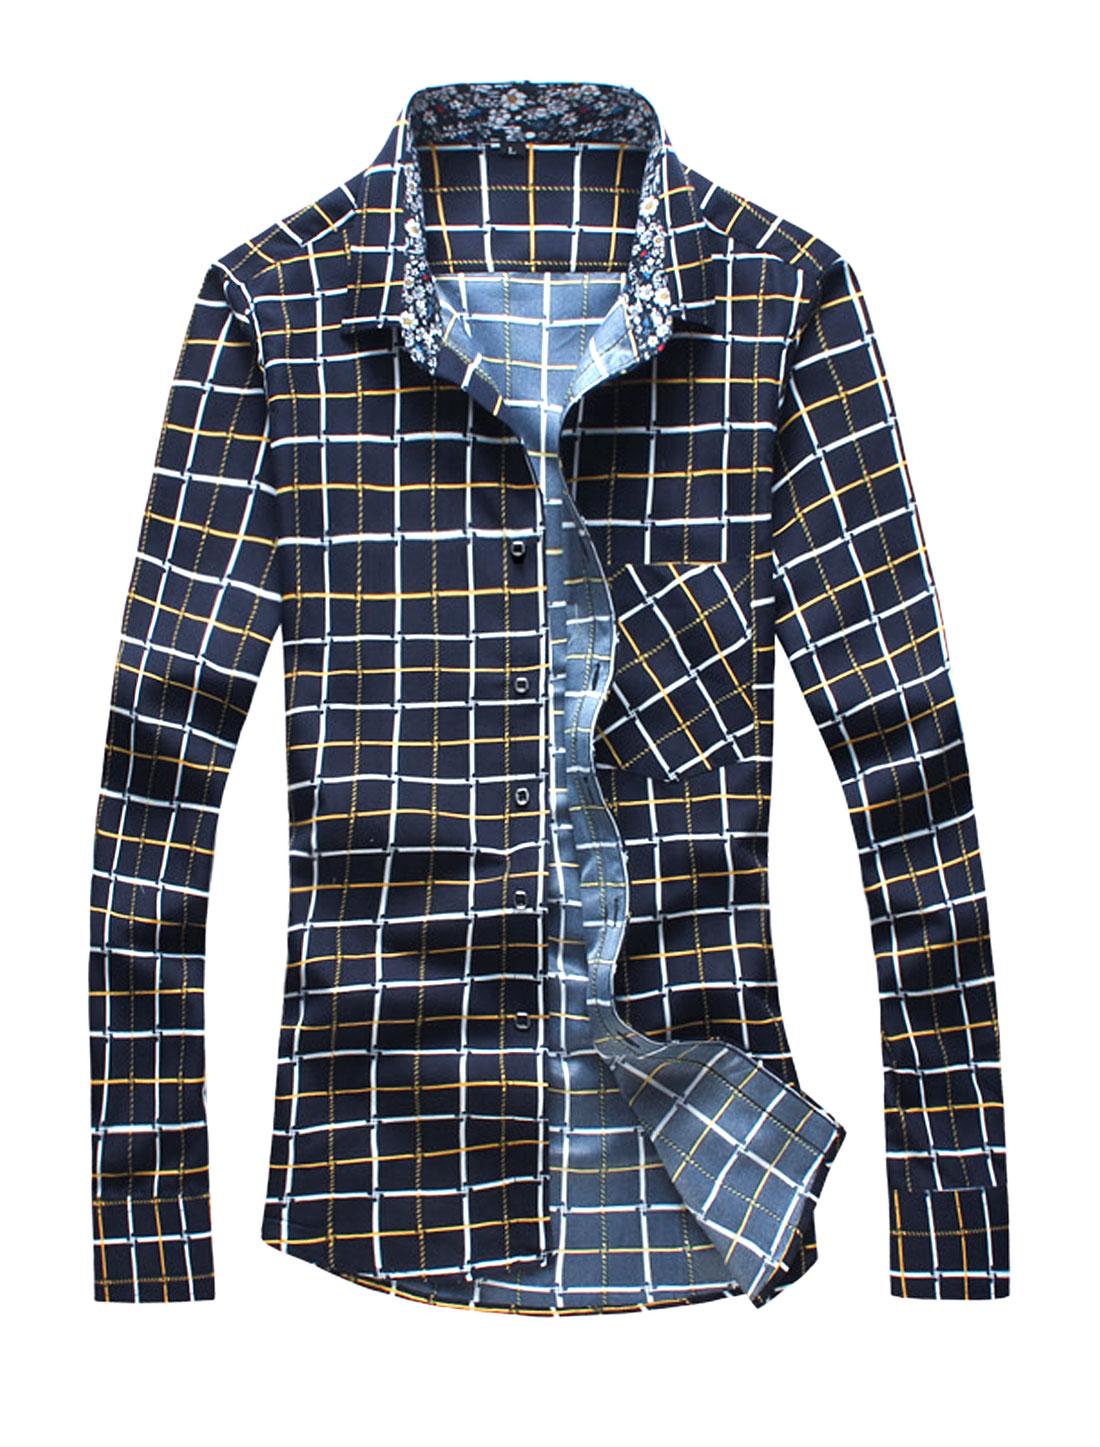 Men Long Sleeves Slim Fit Button Closure Plaids Shirt Yellow M